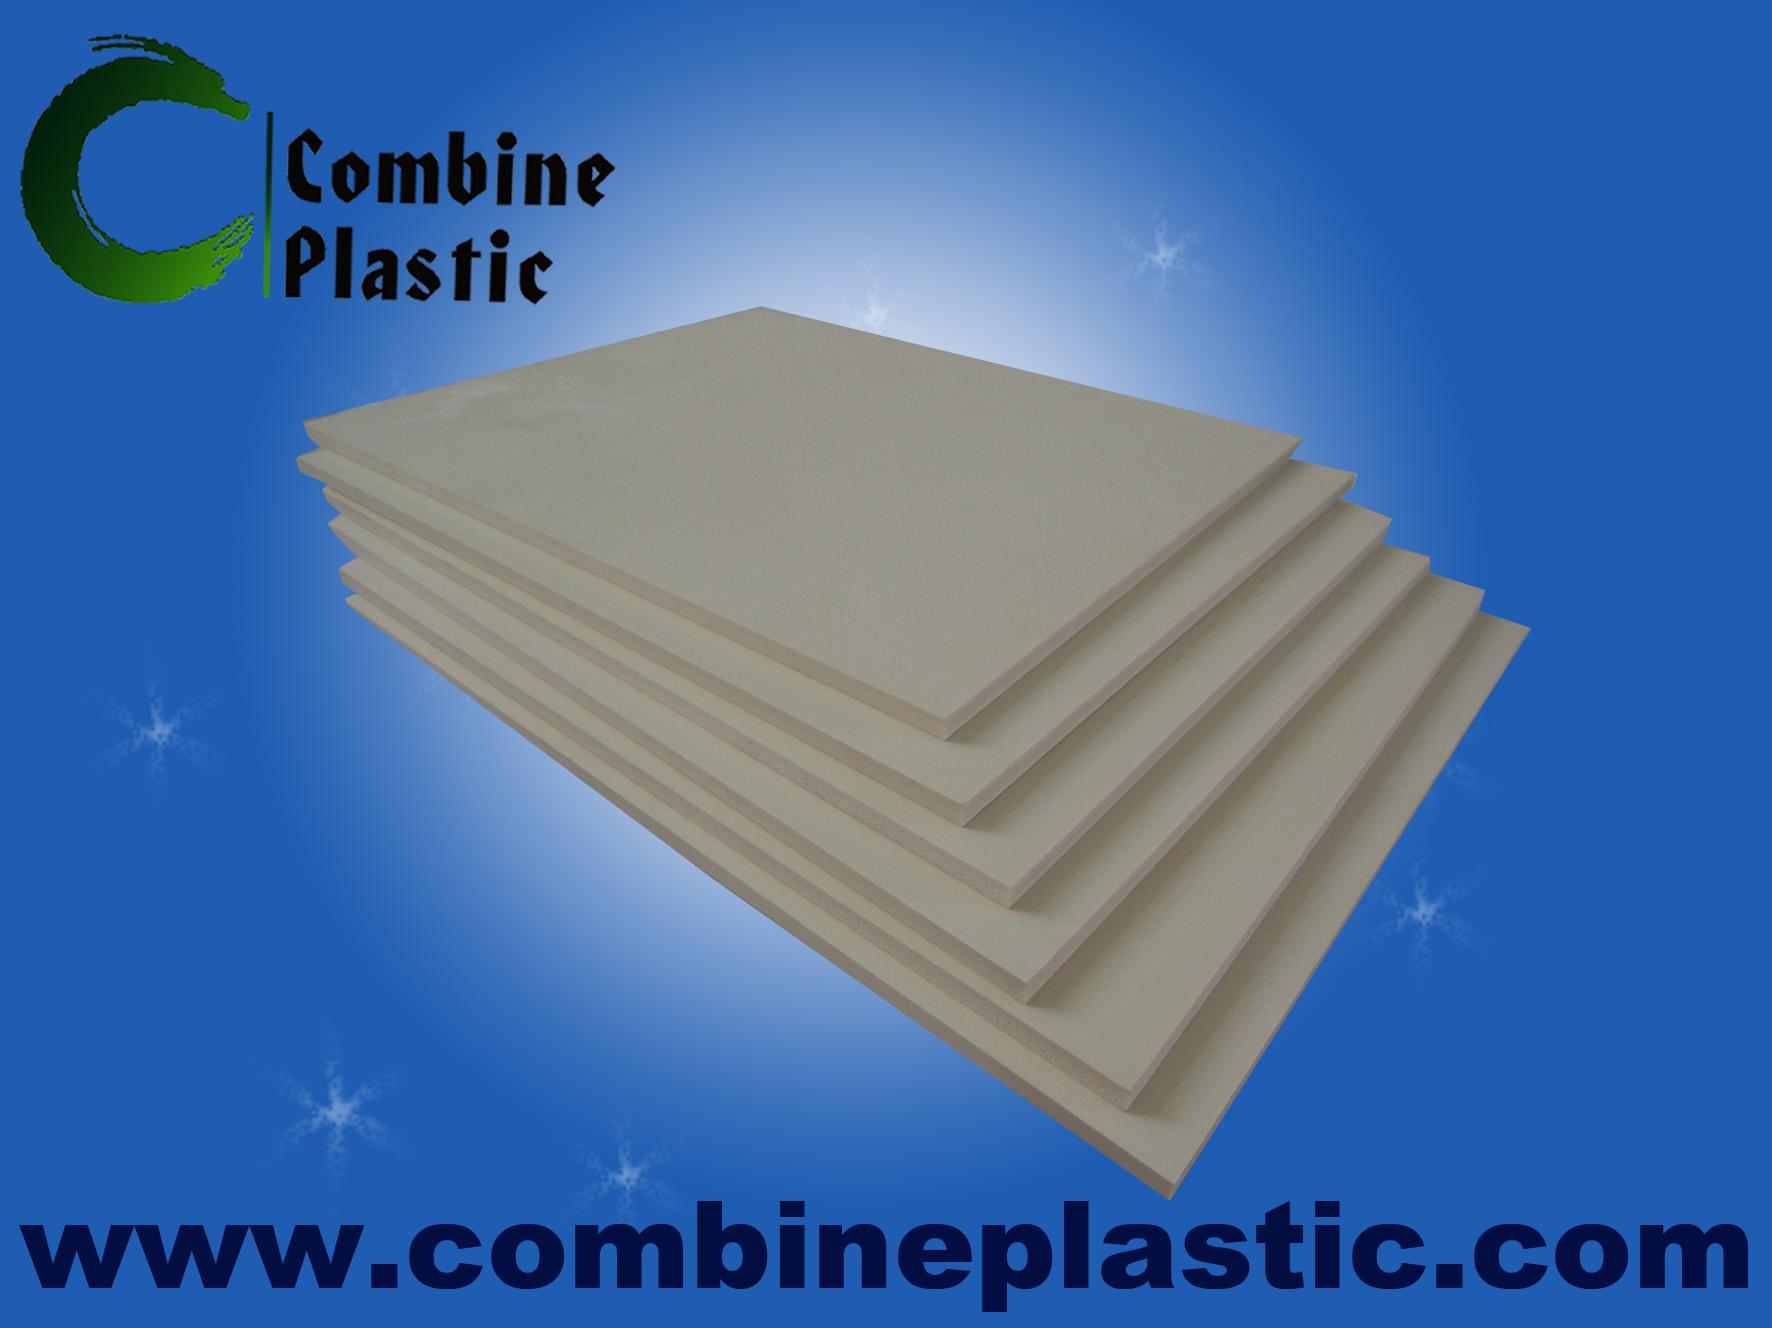 hotsales good quality pvc foam sheet from combine plastic